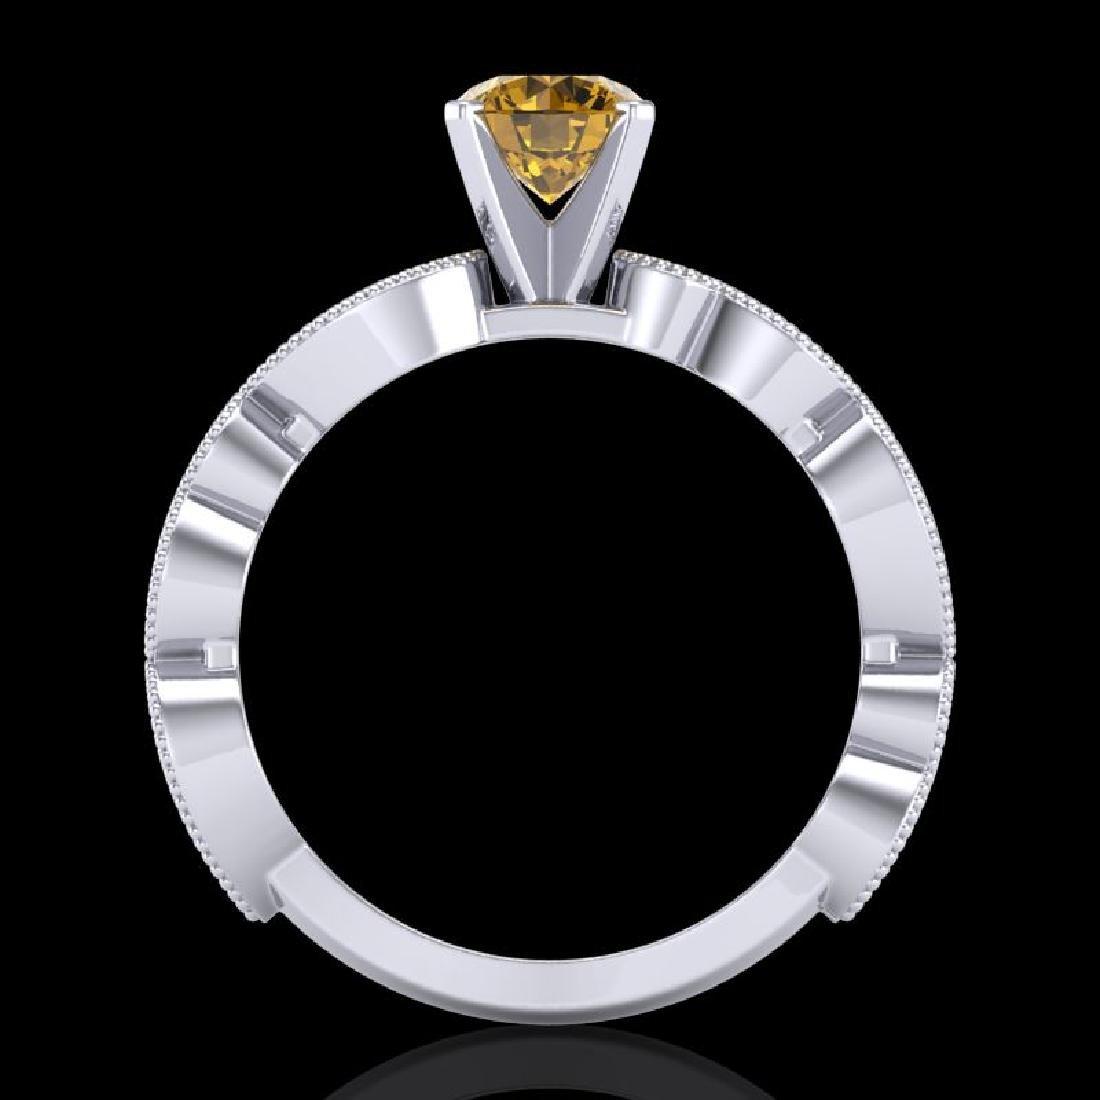 1.01 CTW Intense Fancy Yellow Diamond Engagement Art - 3